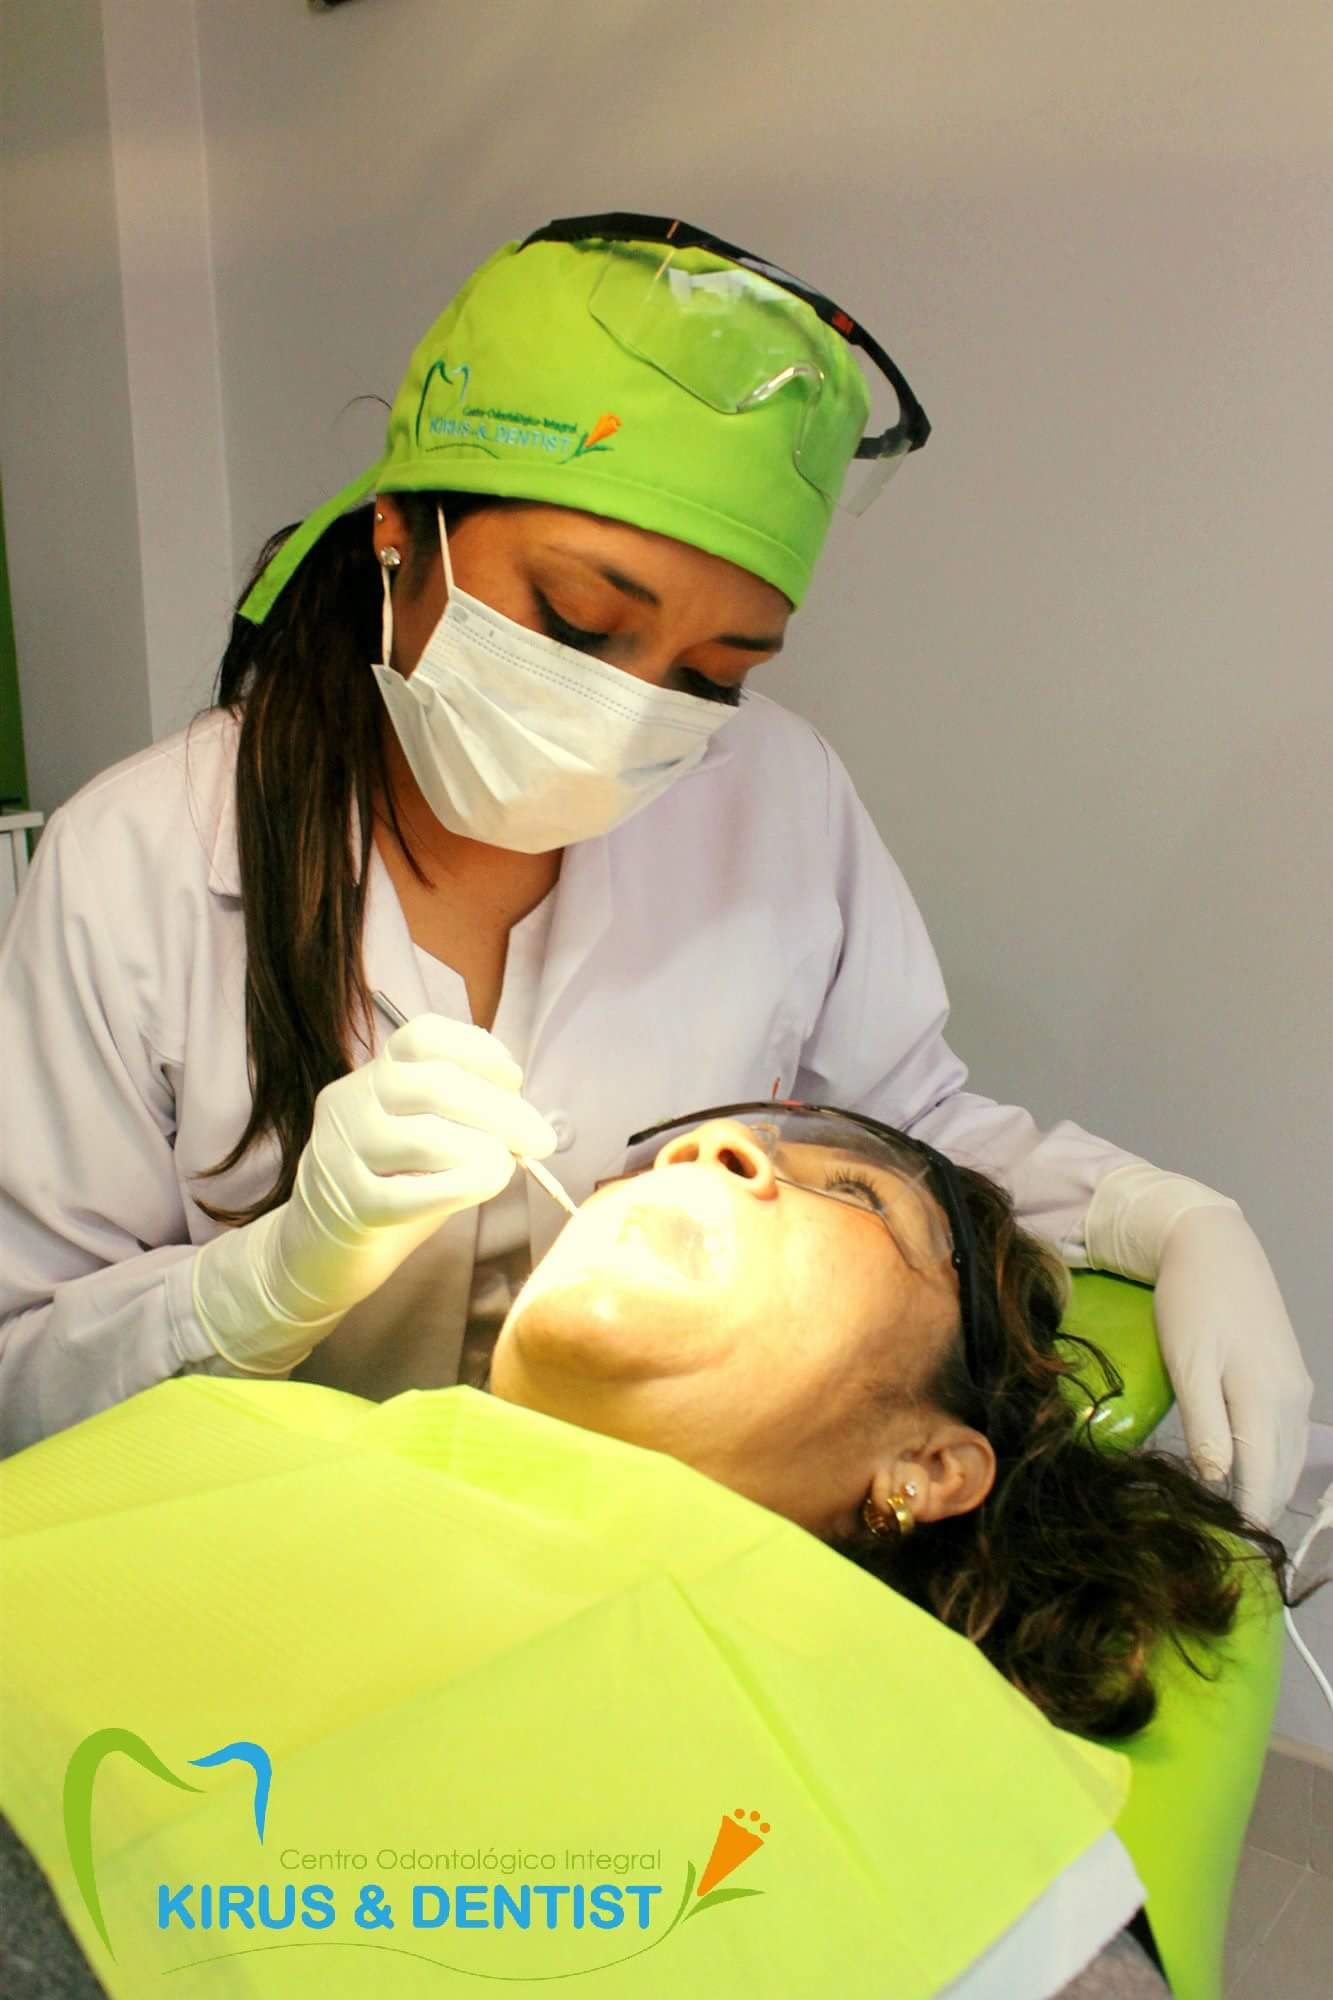 Kirus & Dentist (Centro Odontológico )